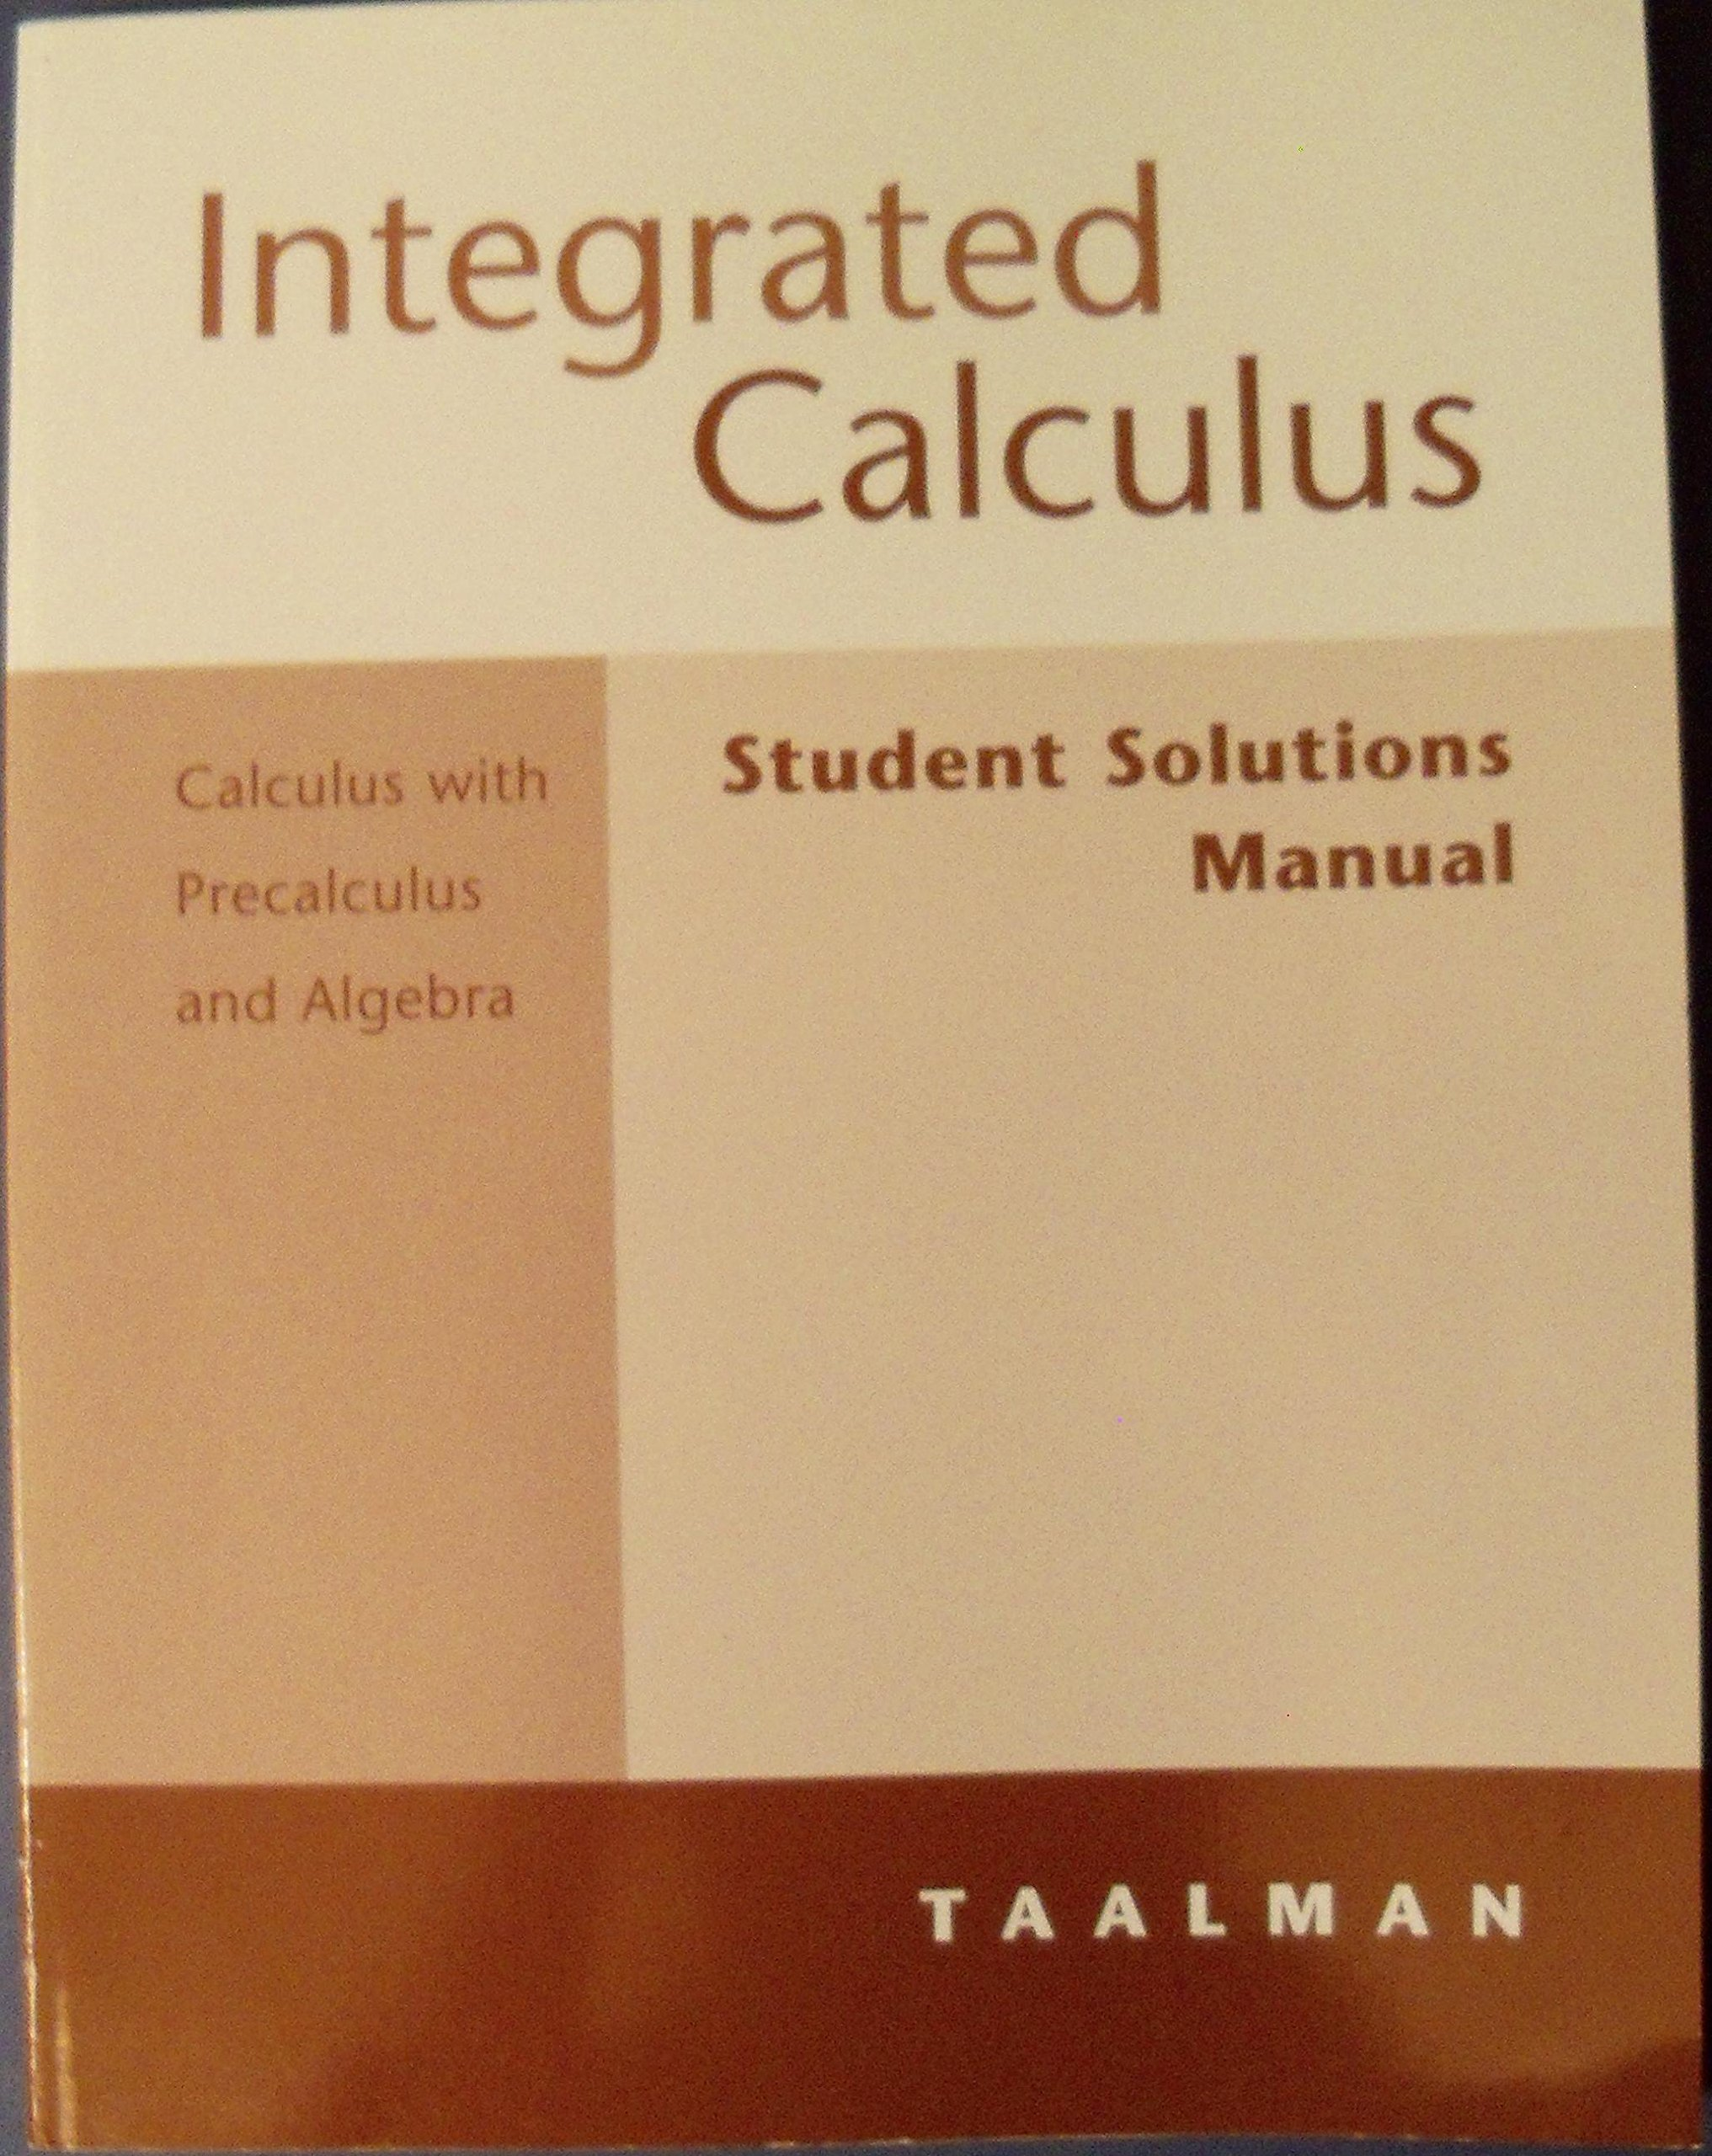 Integrated Calculus Student Solutions Manual: Laura Taalman: 9780618219513:  Books - Amazon.ca